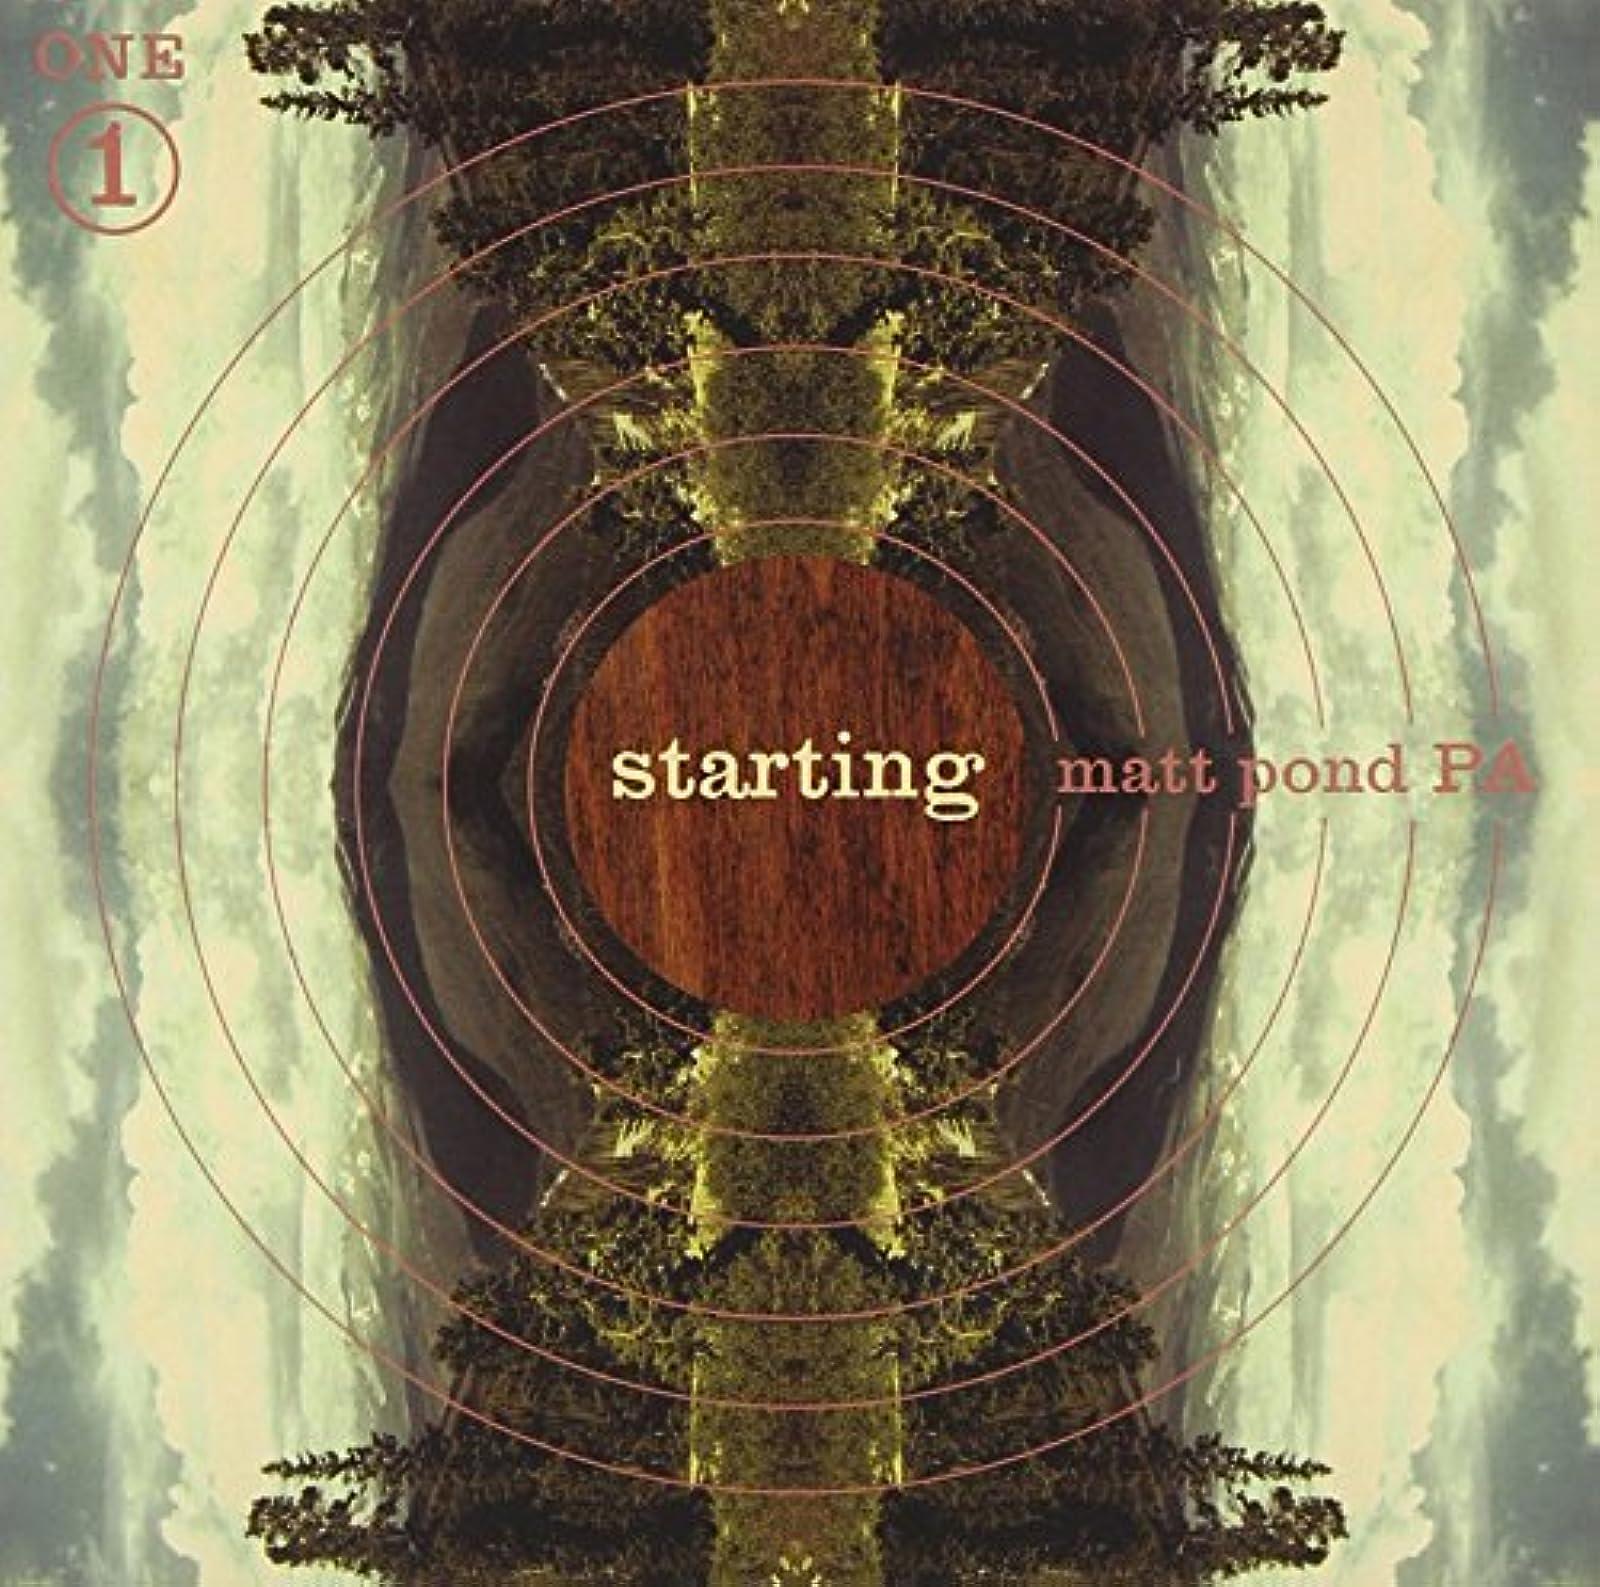 Starting By Matt Pond Pa On Vinyl Record LP